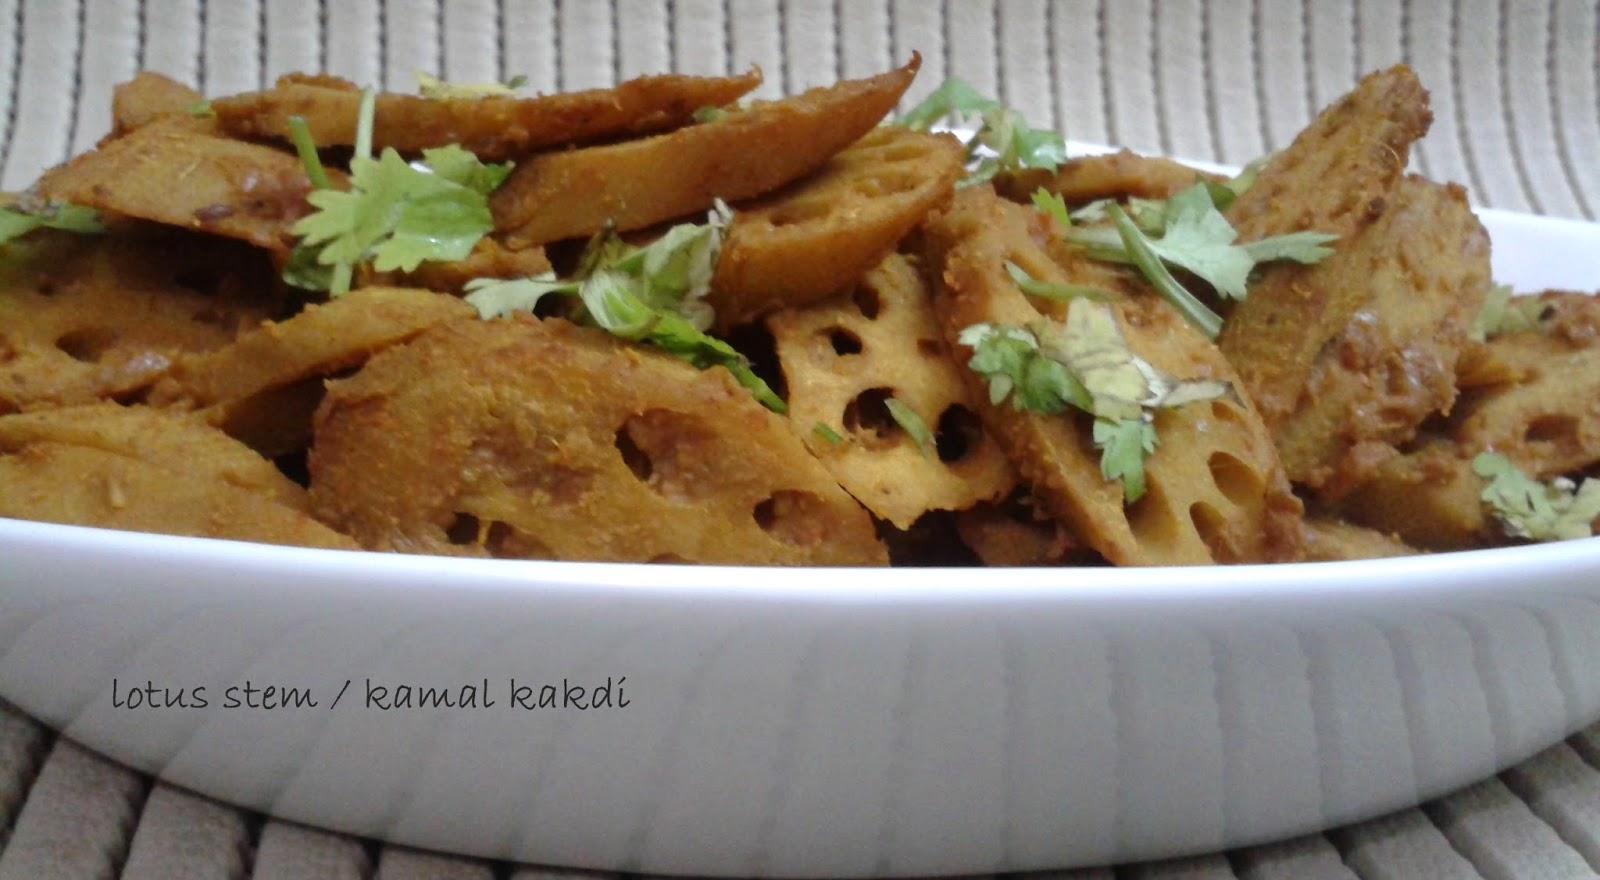 http://www.paakvidhi.com/2015/04/chat-pati-kamal-kakdi-ki-sabzi.html